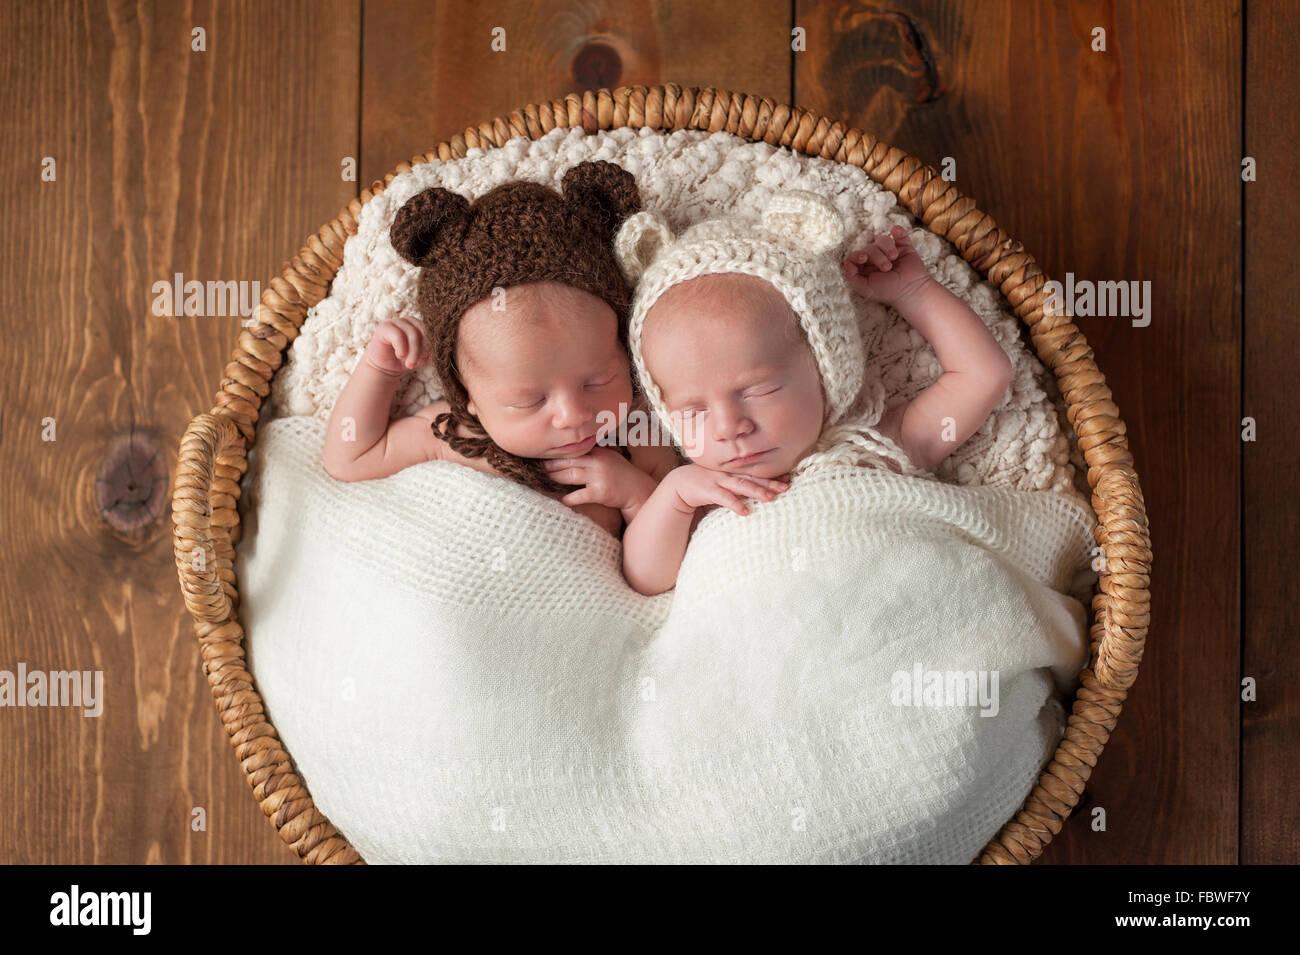 Twin Baby Boys Wearing Bear Bonnets Stock Photo  93373839 - Alamy f4a58508d3f